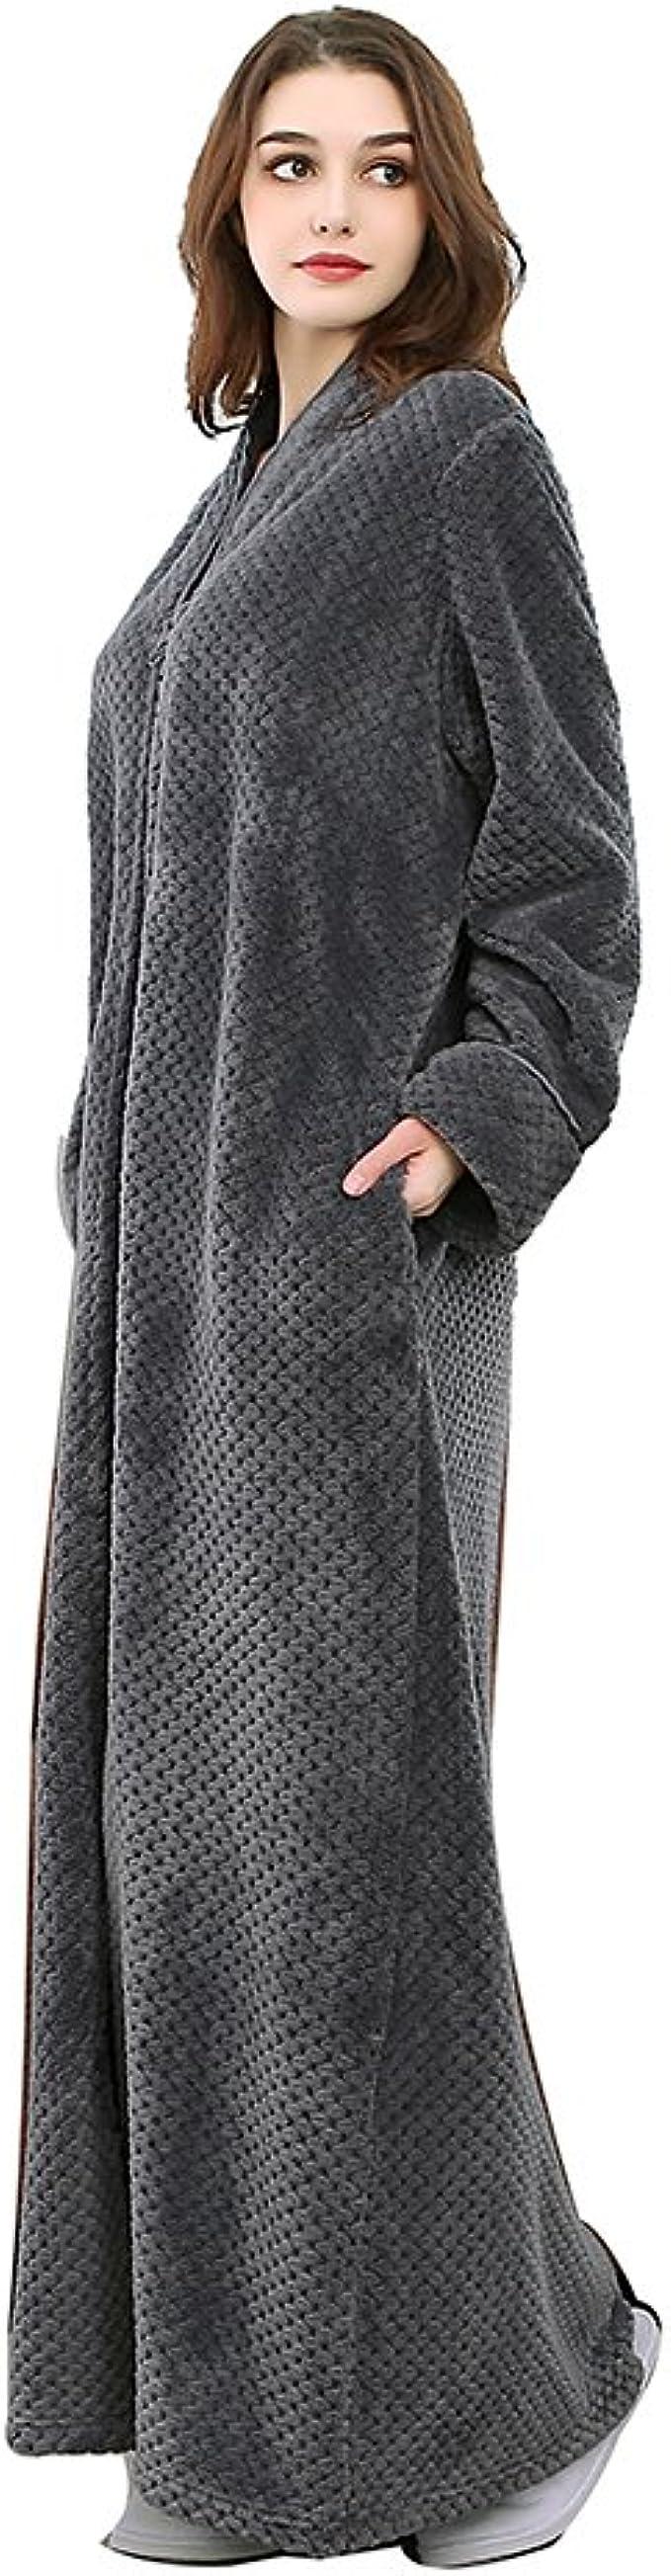 Womens Dressing Gown Luxury Robe Fleece Mothers Day Housecoat 14 16 18 20 22 24